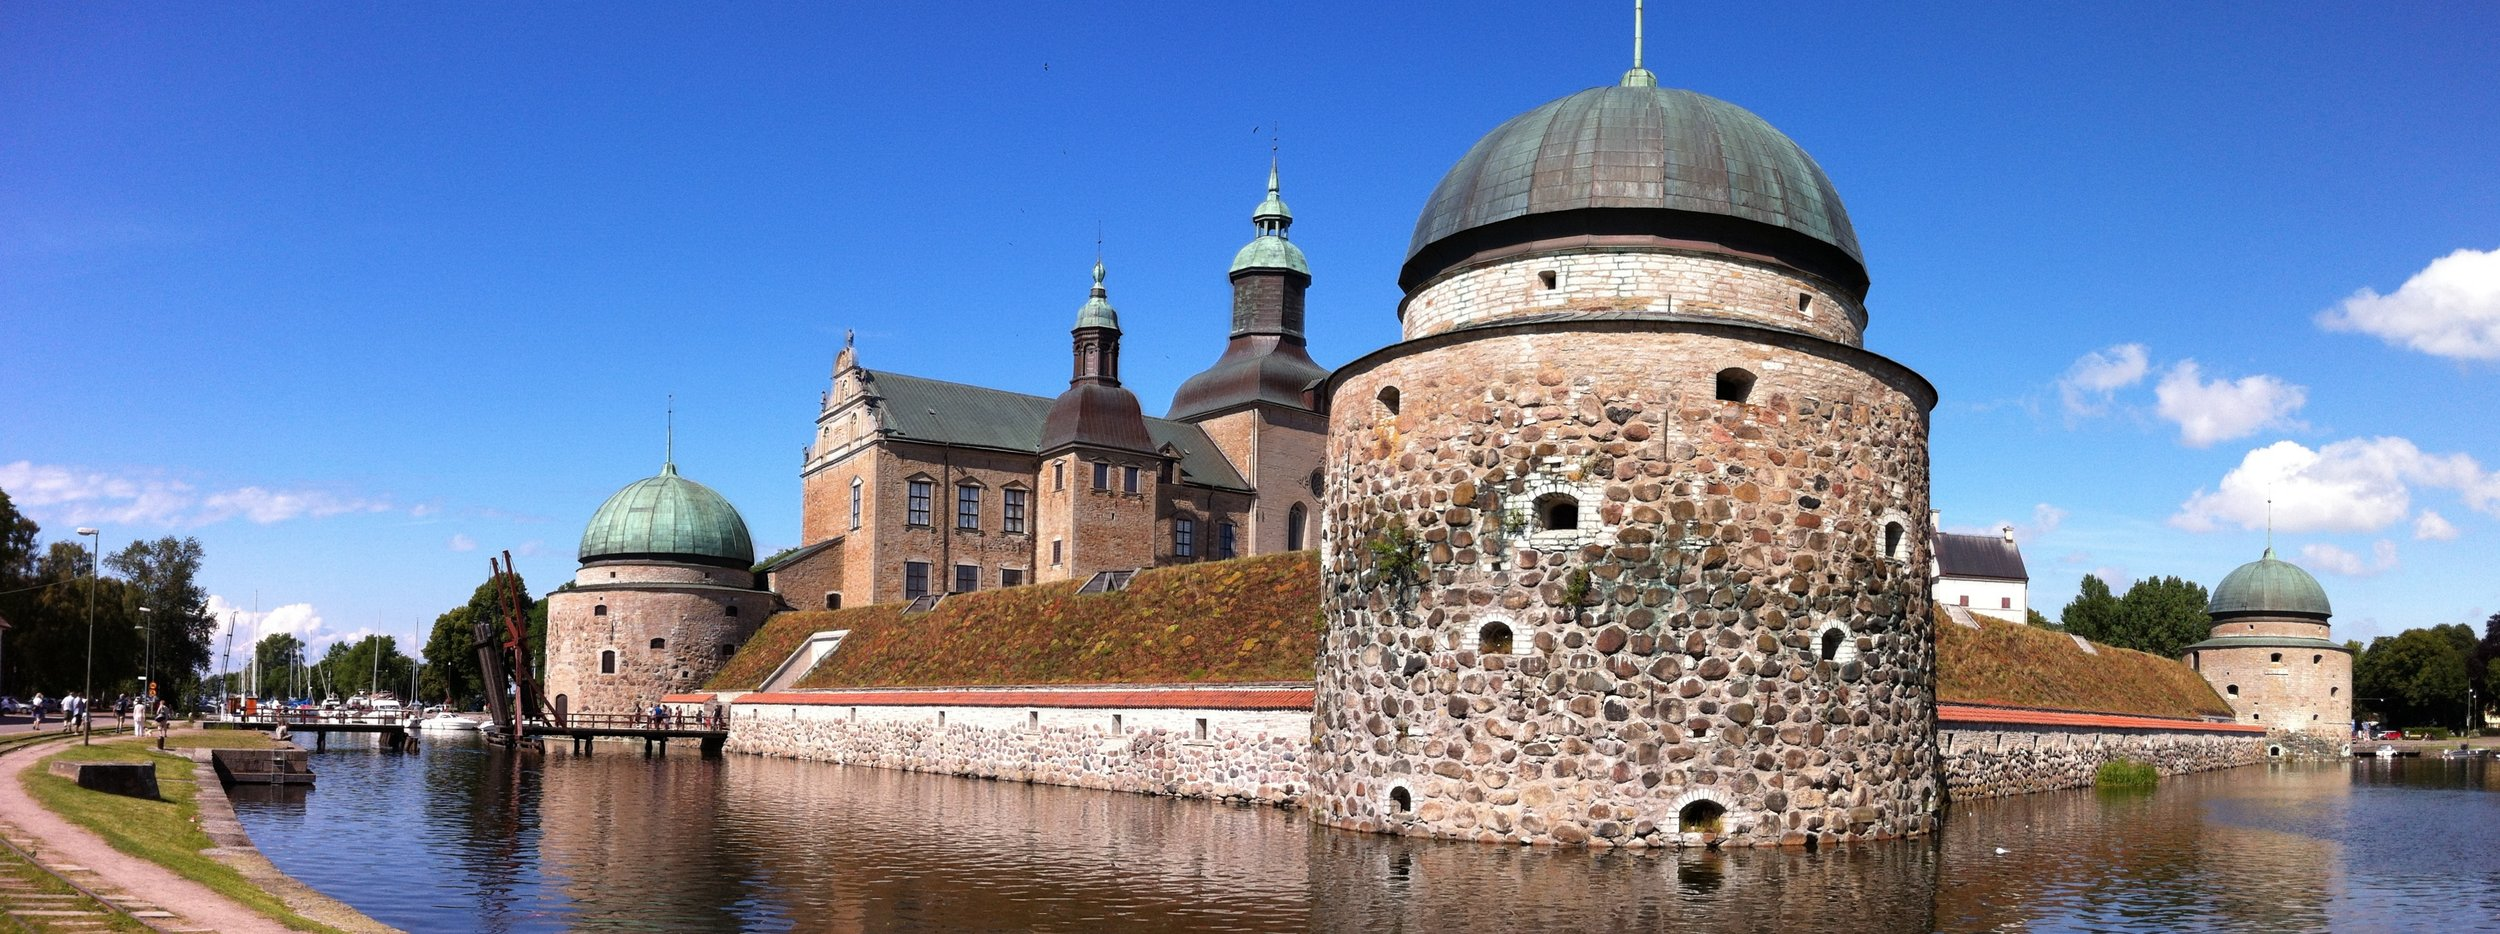 Vadstena_Castle.jpeg